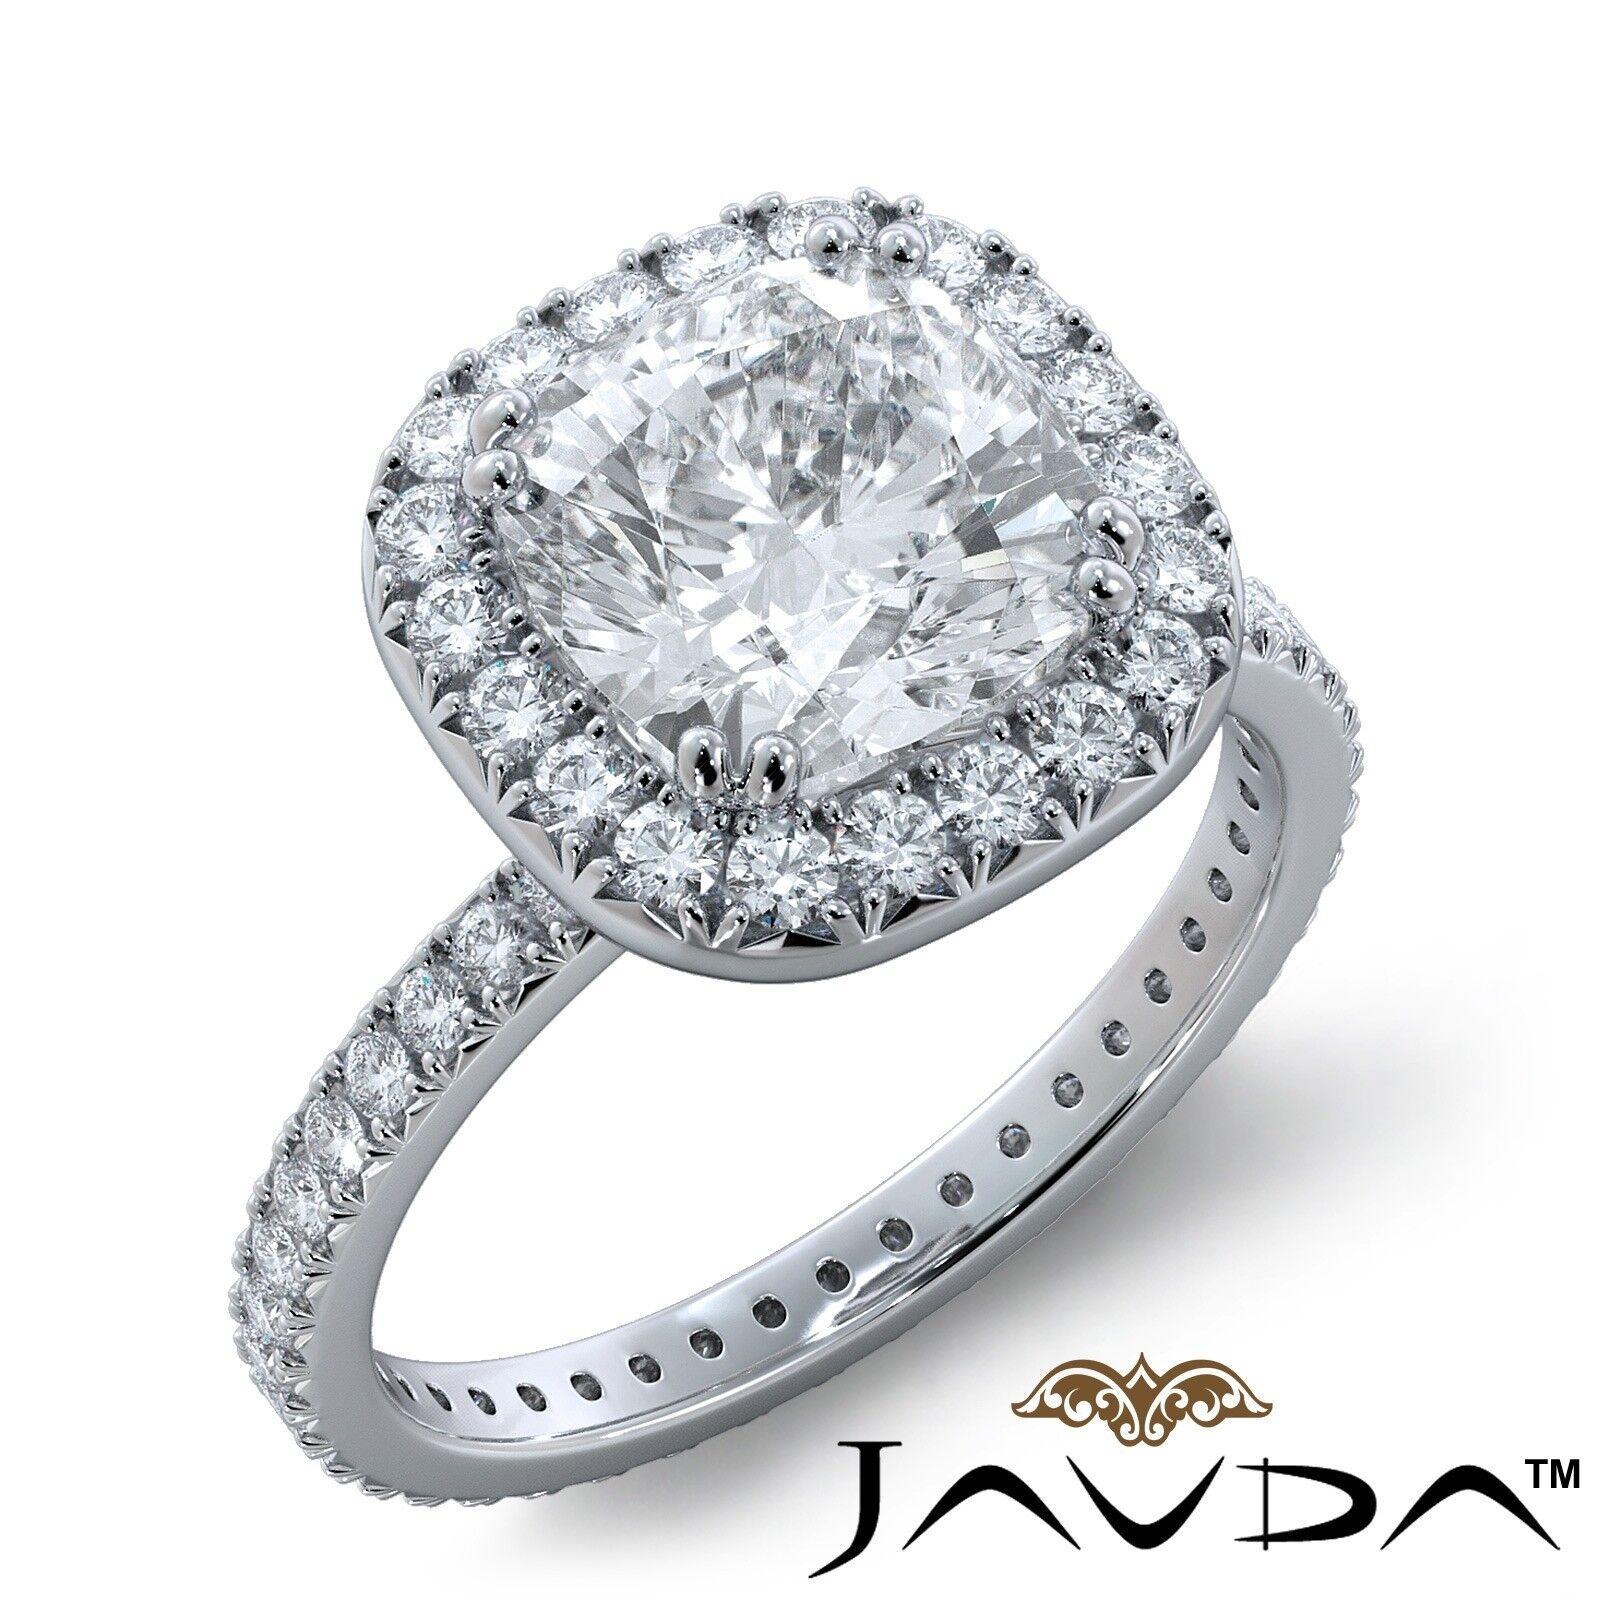 2.45ctw Slim Halo Style Cushion Diamond Engagement Ring GIA E-VVS1 White Gold